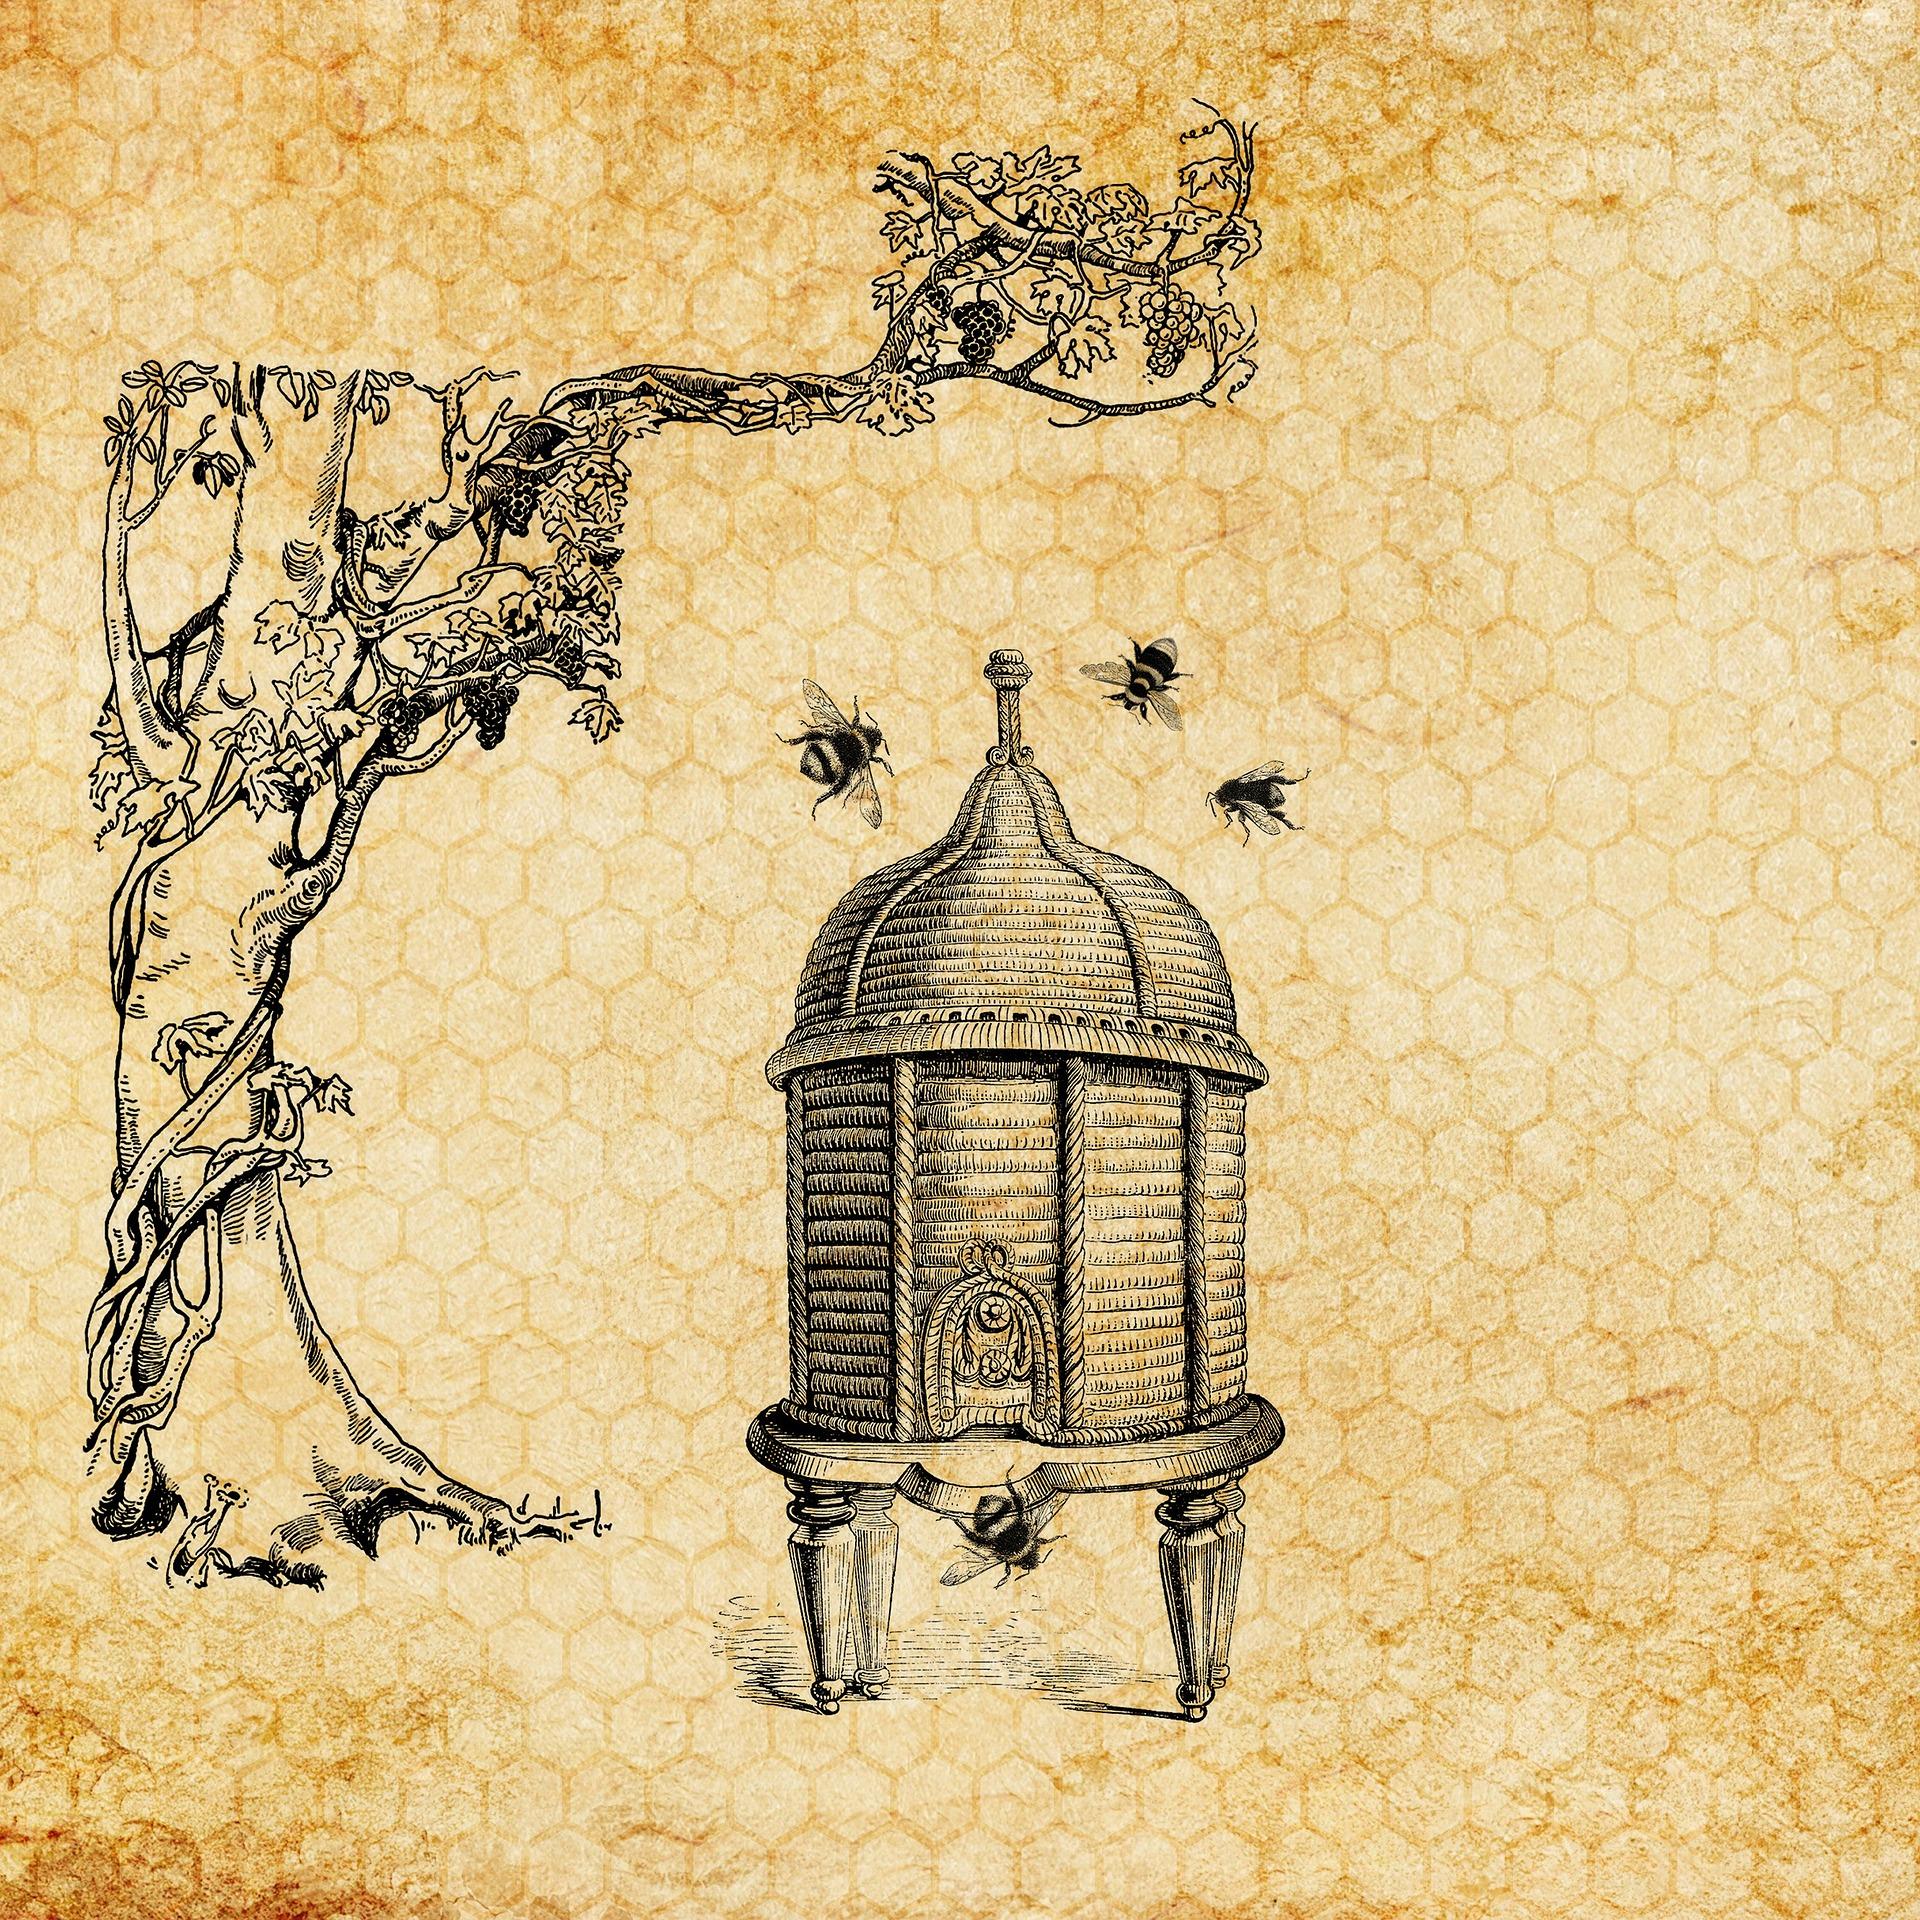 beehive-3434143_1920